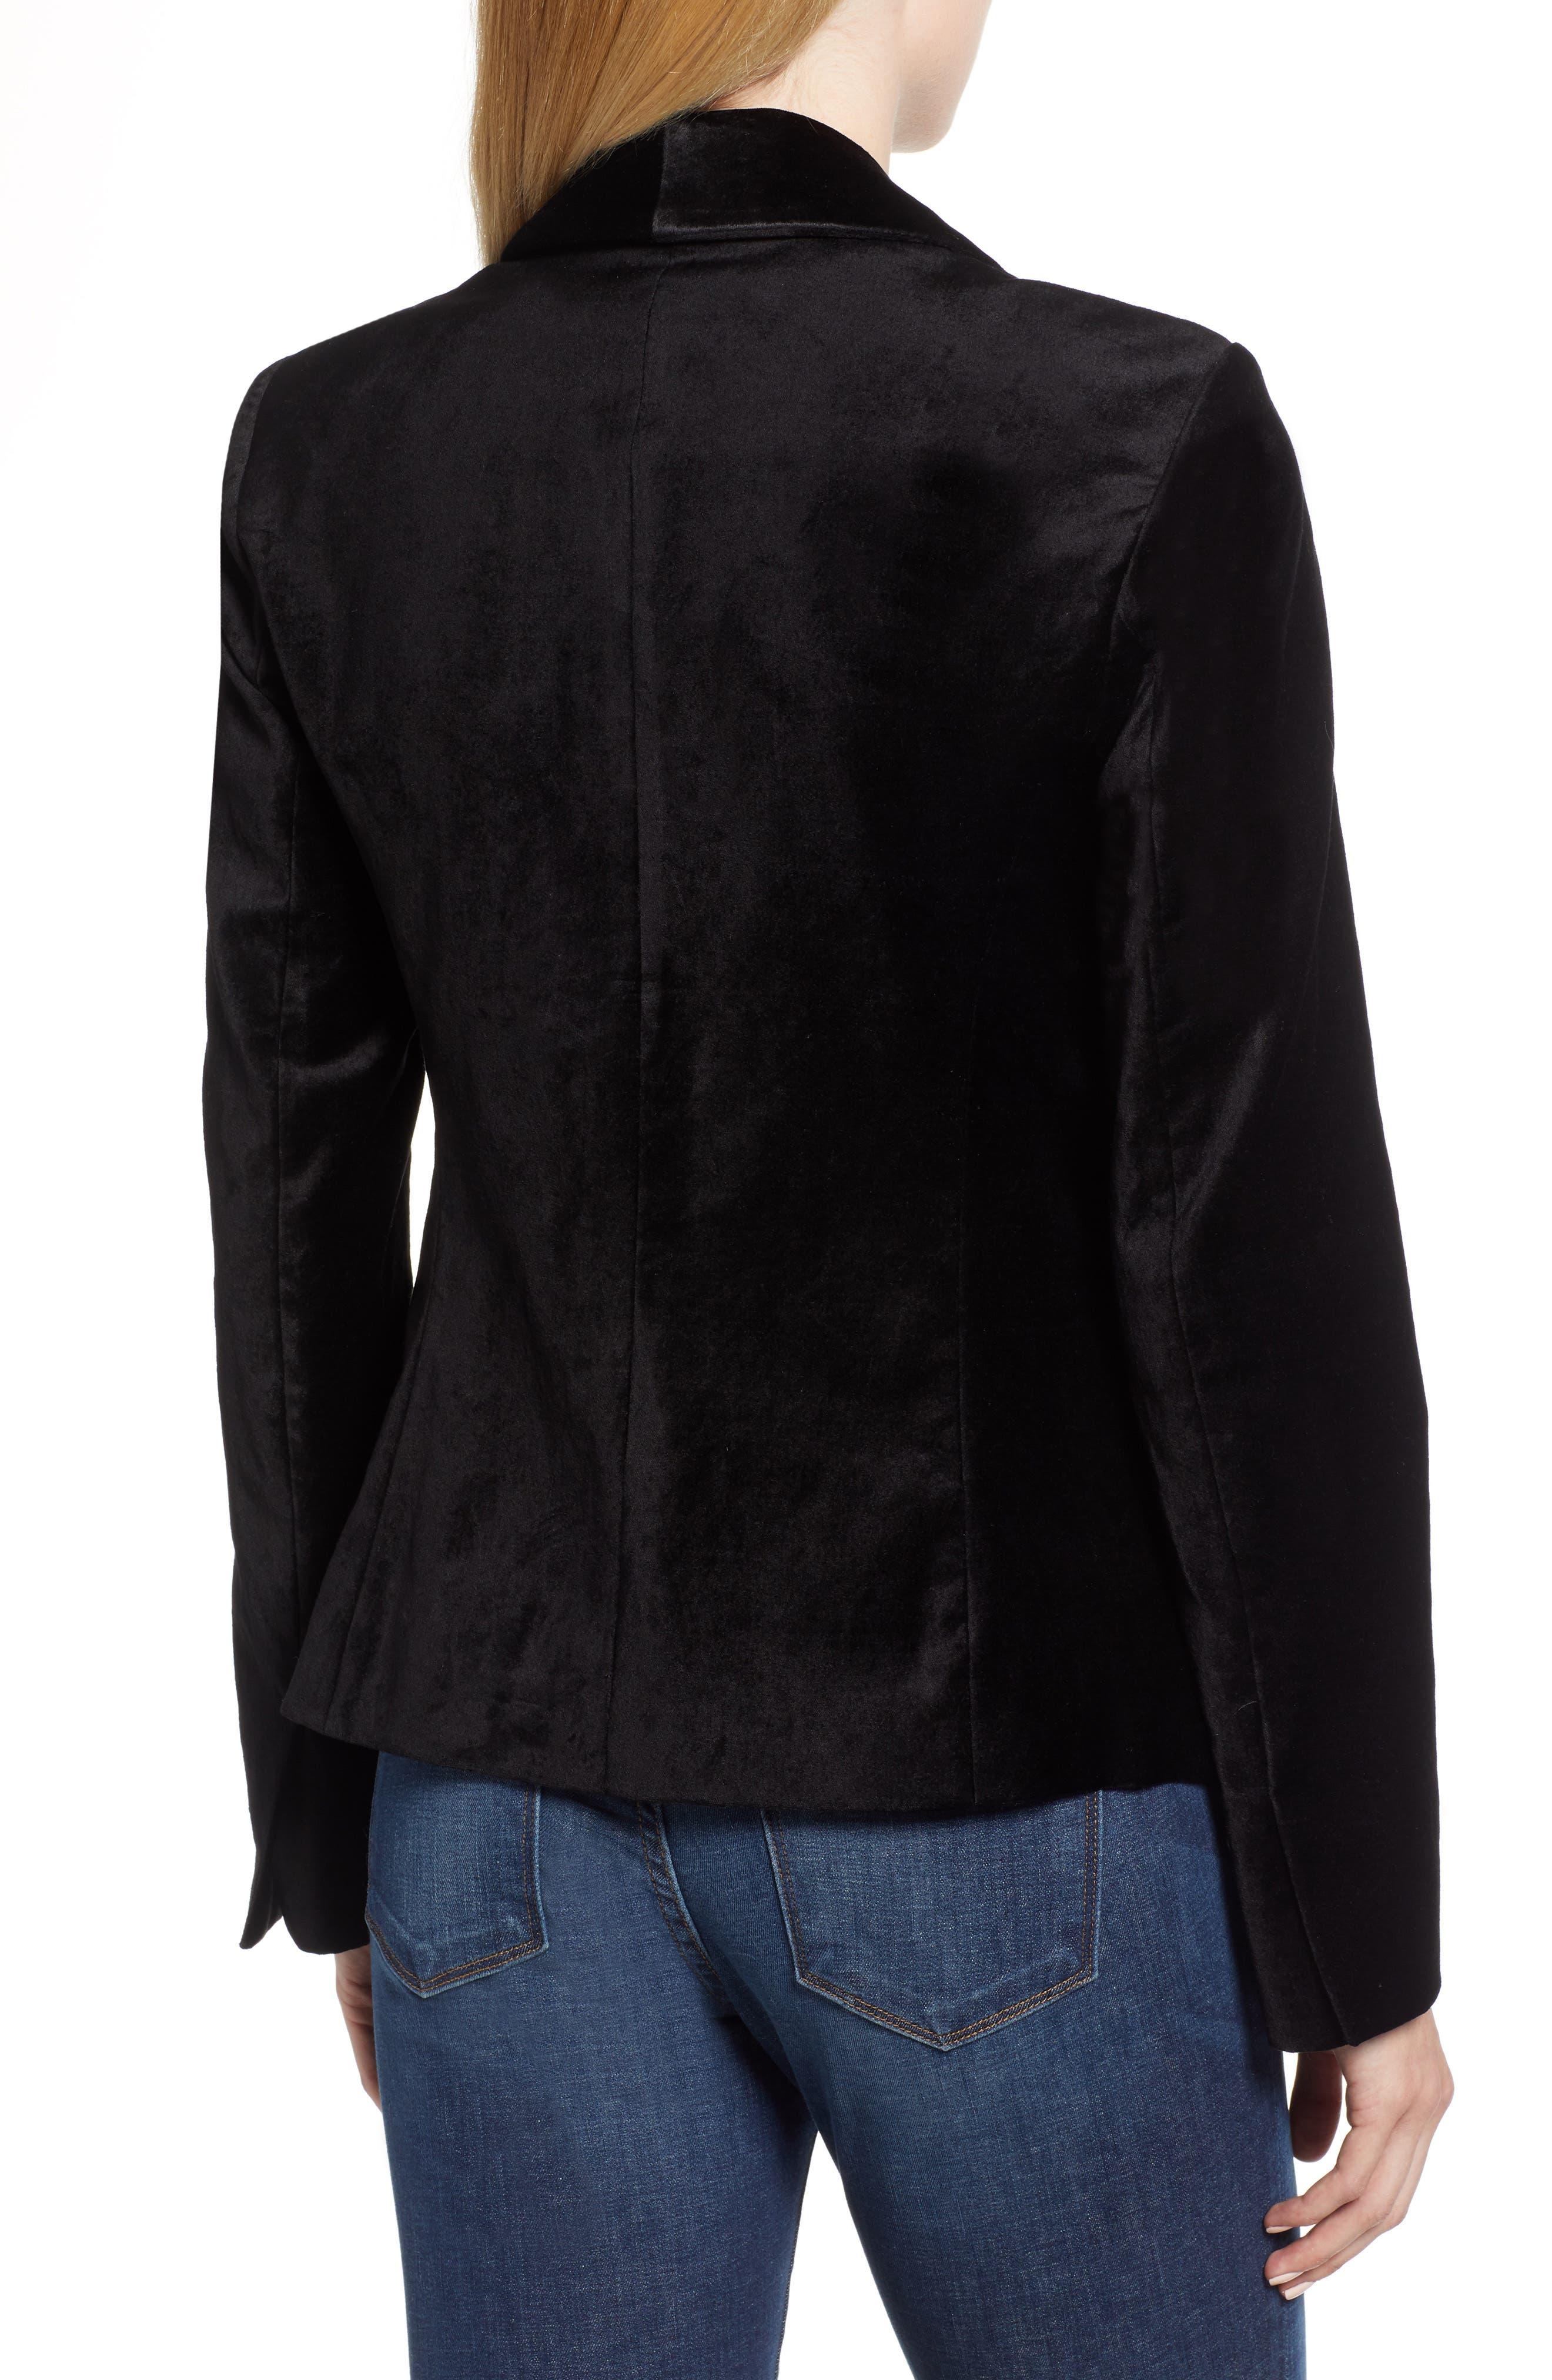 JEN7 BY 7 FOR ALL MANKIND, Stretch Cotton Velvet Blazer, Alternate thumbnail 2, color, BLACK